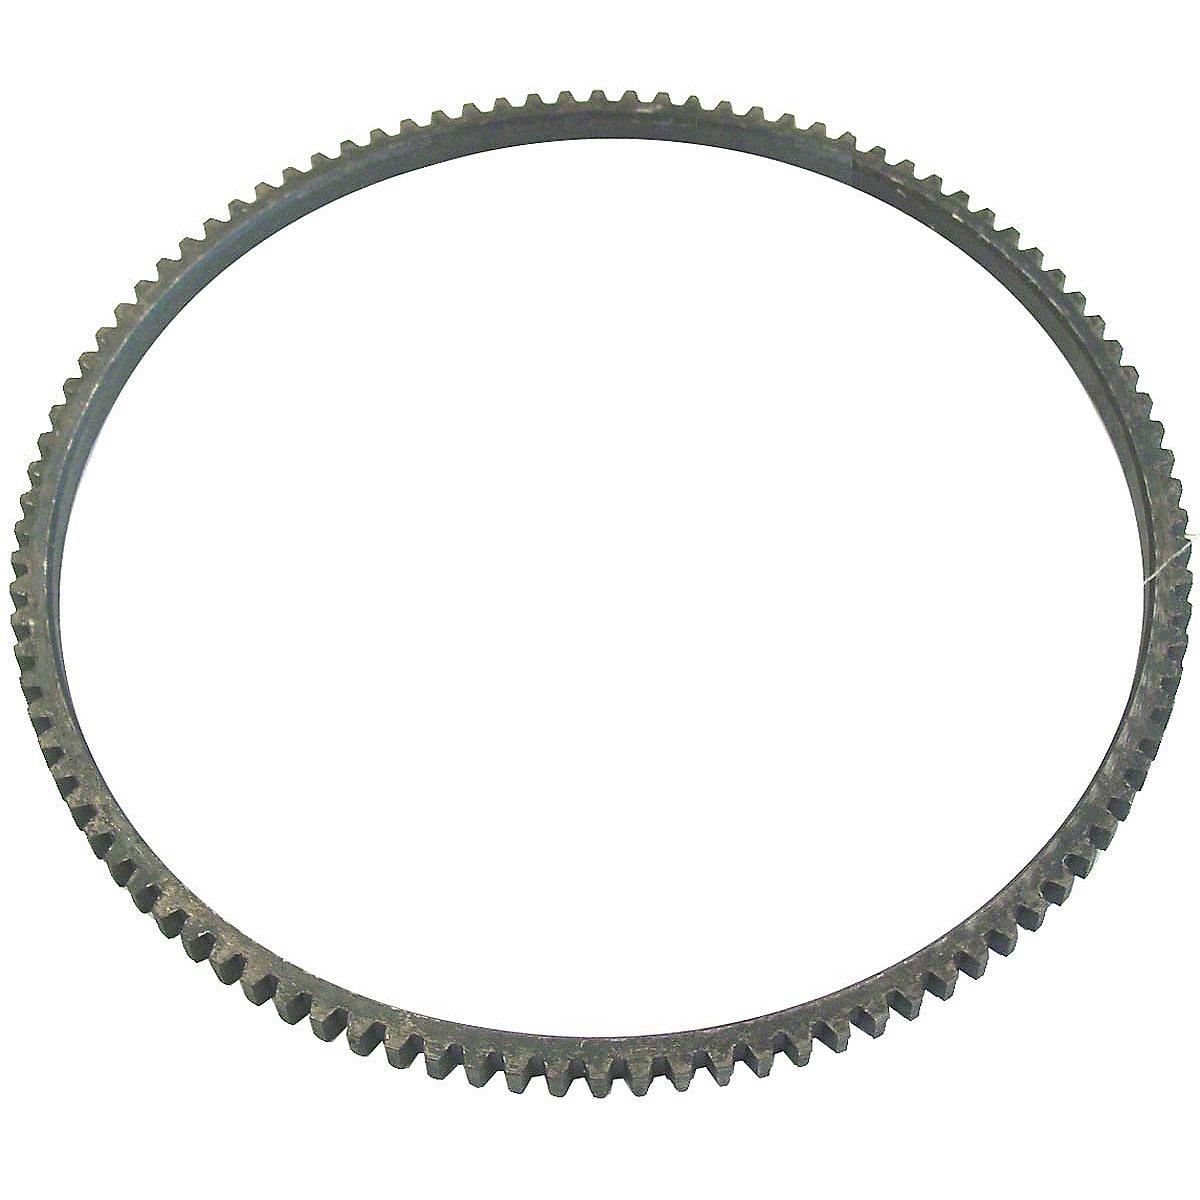 Flywheel Ring Gear For Allis Chalmers: RC, WC, WD, WD45 Gas.